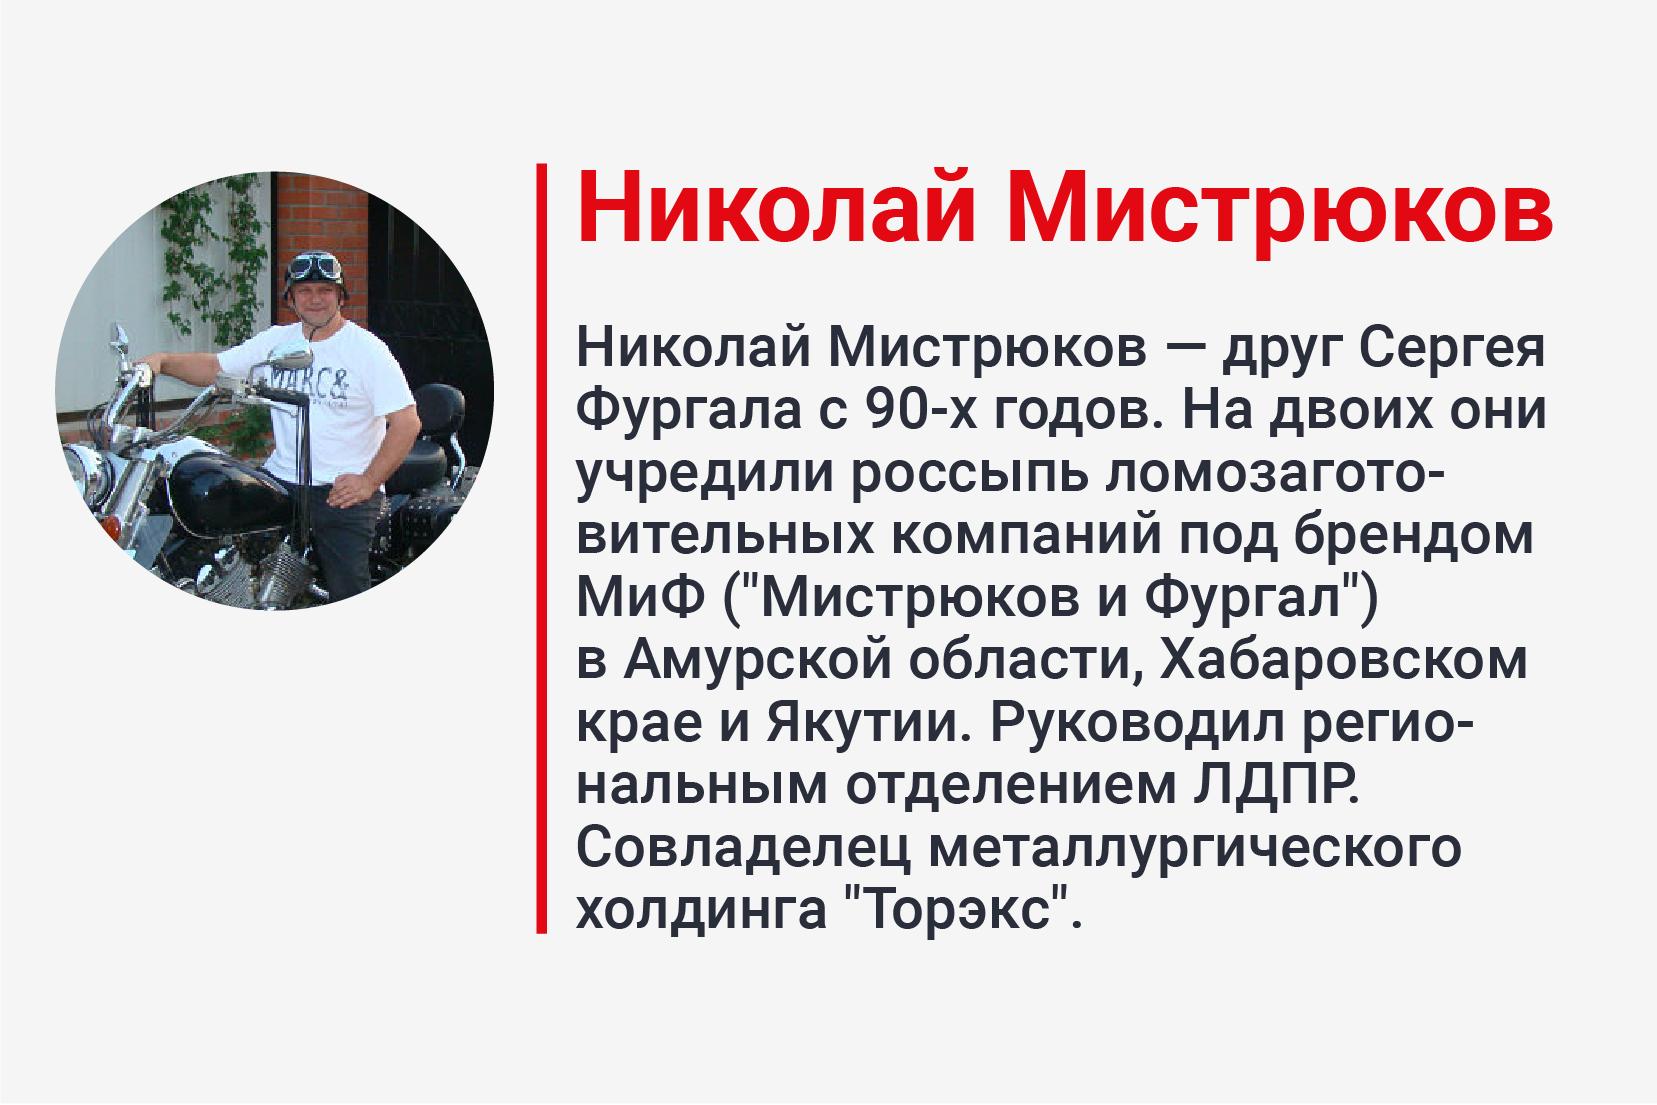 "<p>Фото © <a href=""https://ok.ru/profile/532686964881/album/416178051729/416183237265"" target=""_self"">OK / Николай Мистрюков</a></p>"